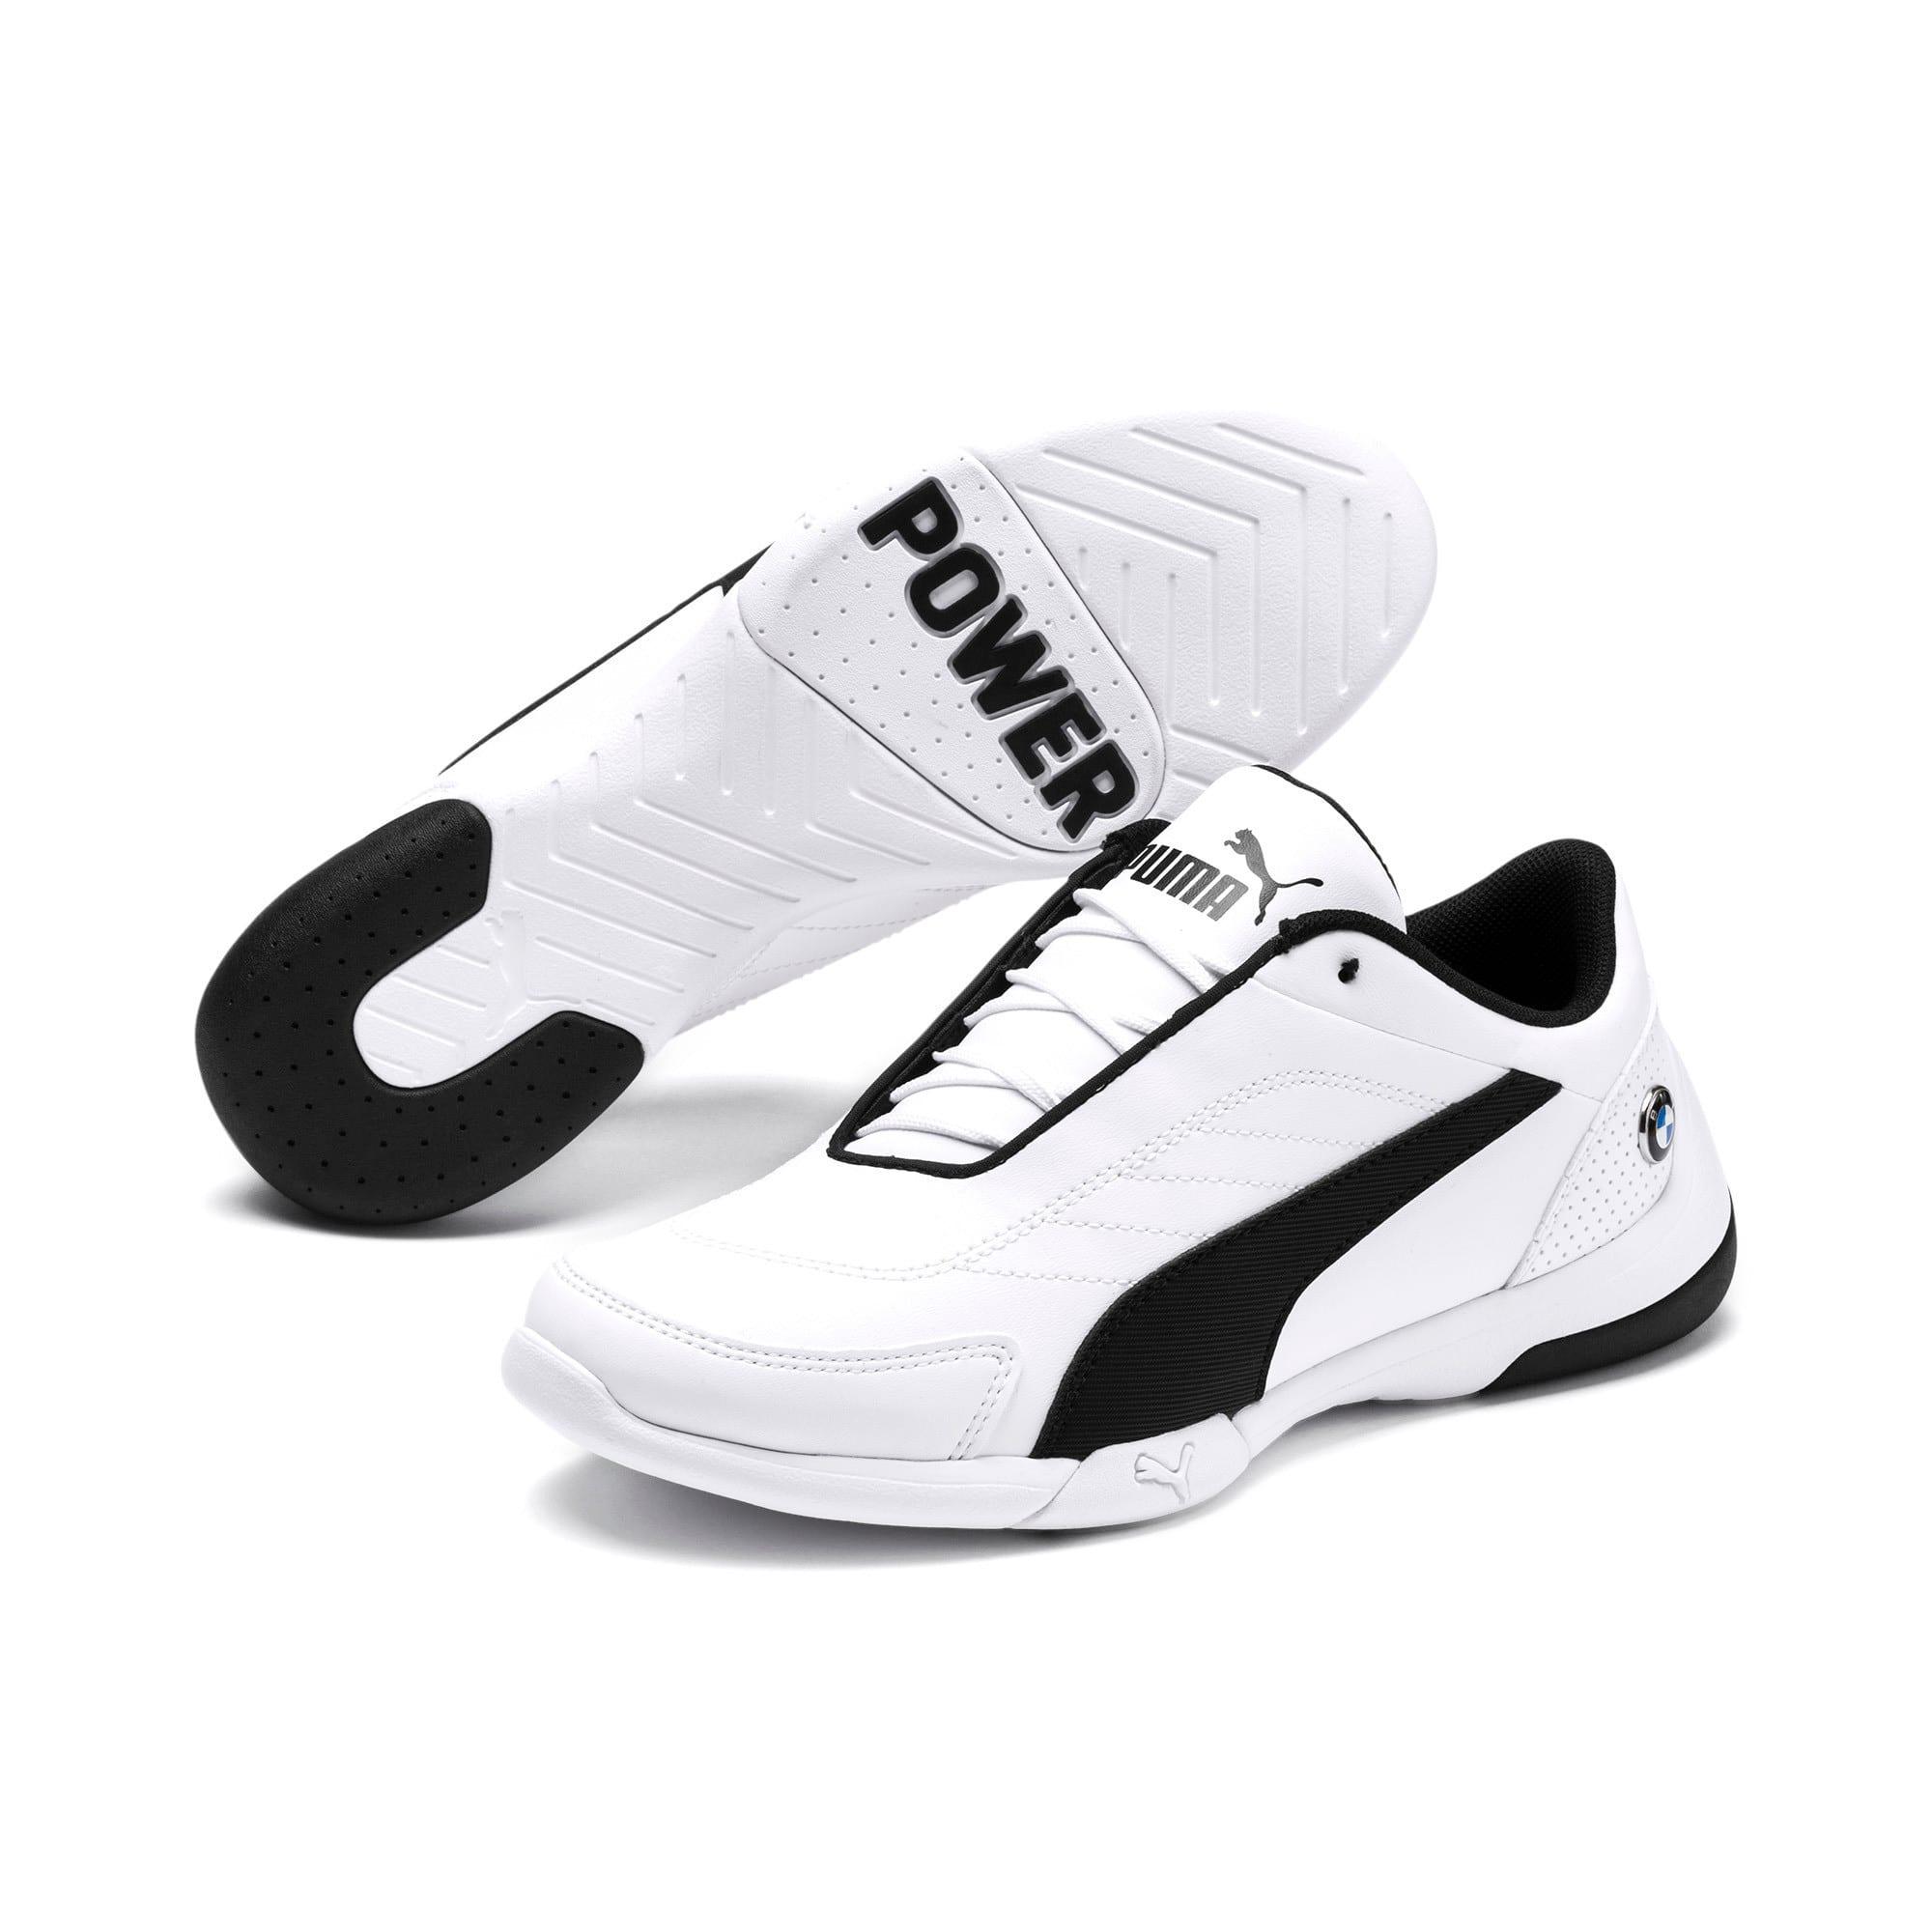 Thumbnail 2 of BMW MMS Kart Cat III Shoes JR, Puma White-Puma Black, medium